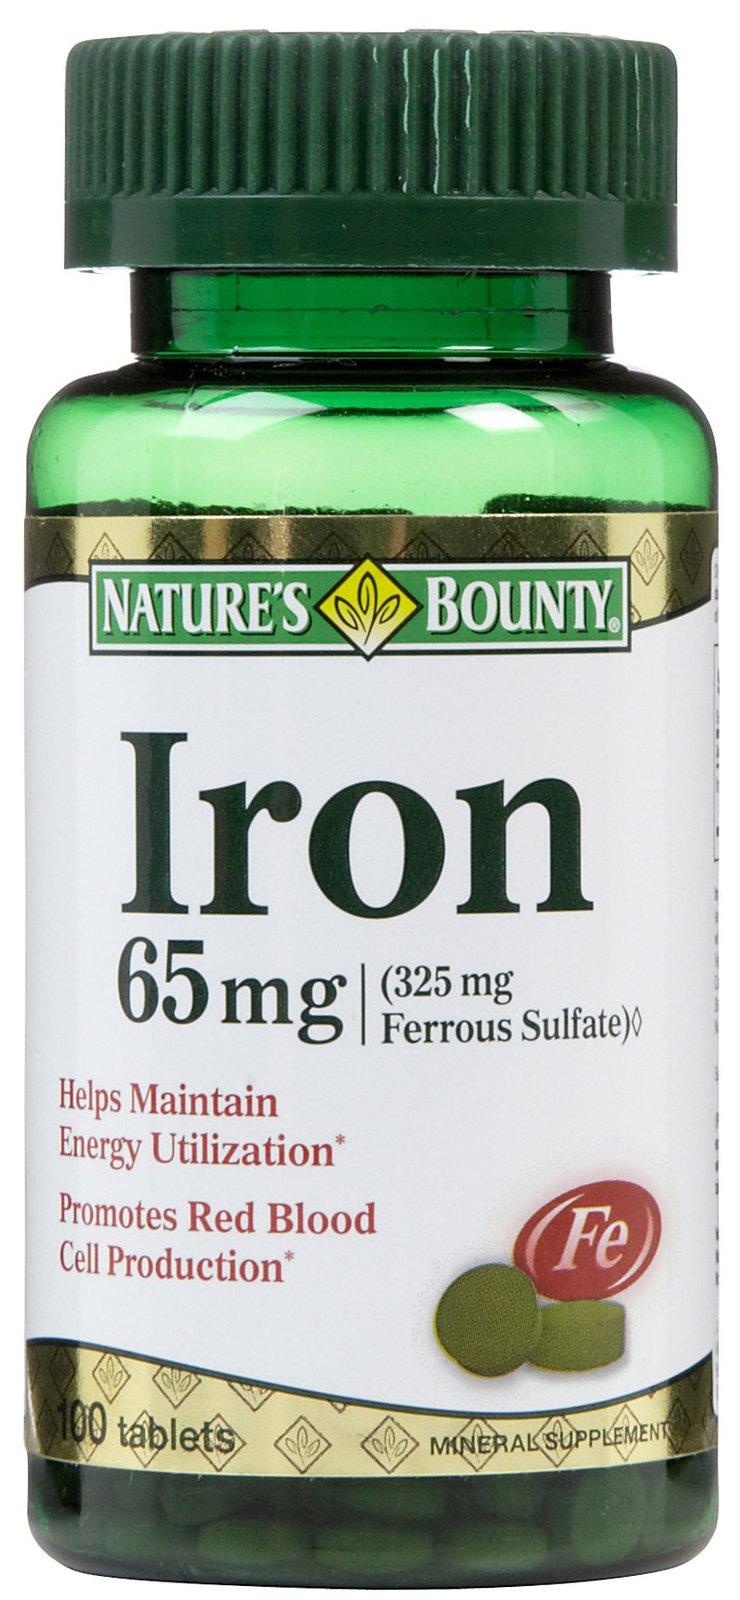 Nature's Bounty Ironn bổ sung sắt